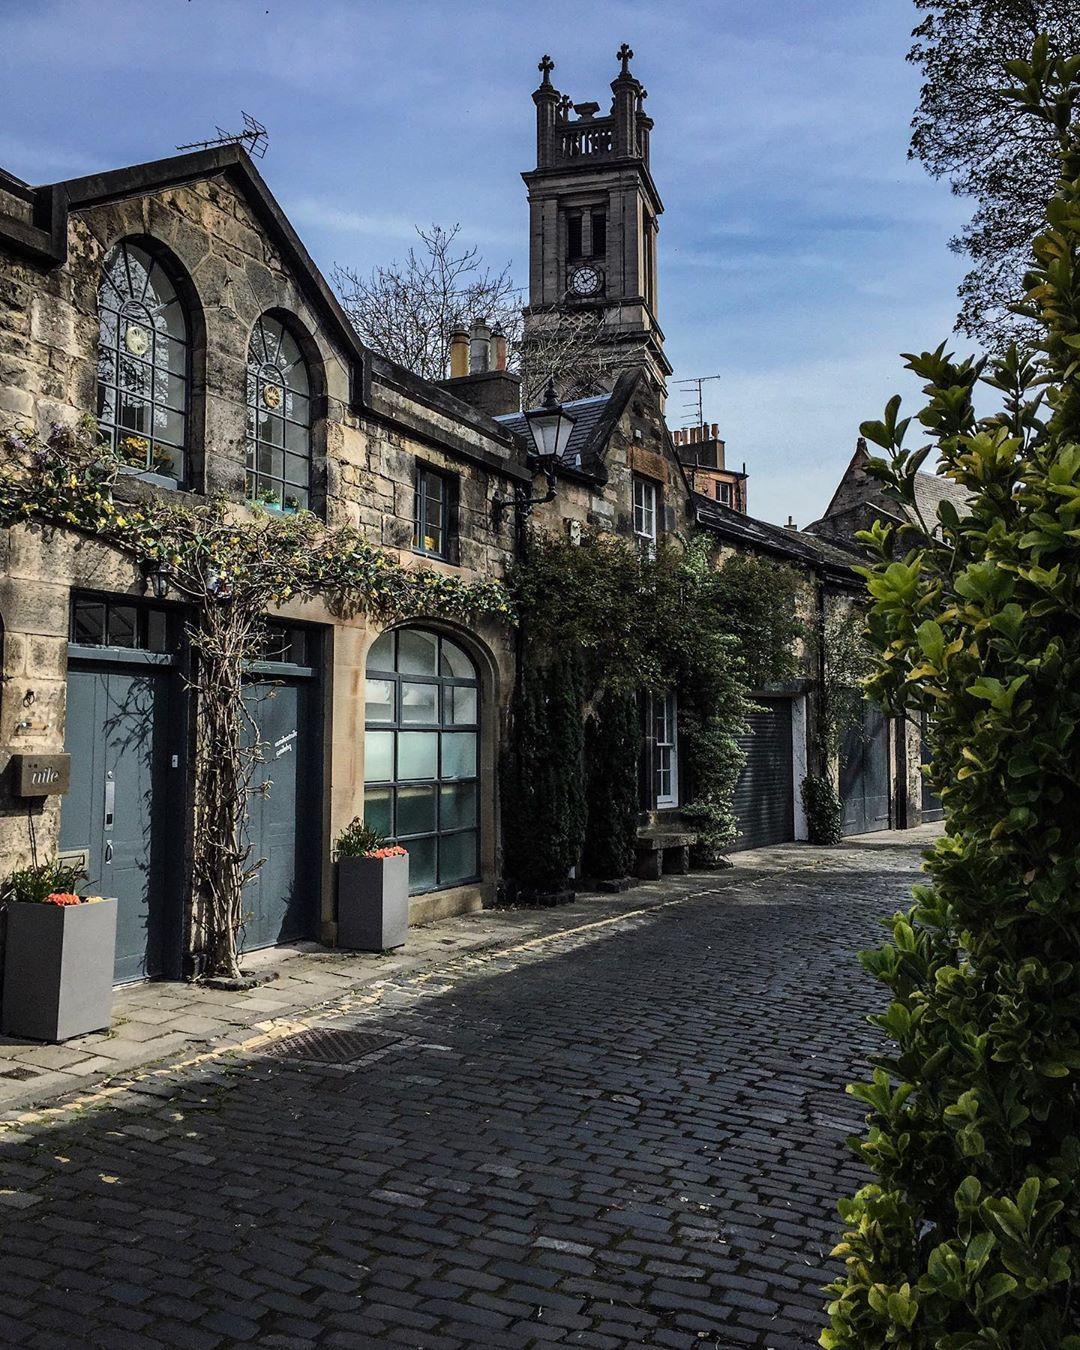 "MyInstaScotland on Instagram: ""Circus Lane in the New Town of Edinburgh  #circuslane #edinburgh #myedinburgh #loveedinburgh #thisisedinburgh #visitscotland…"""